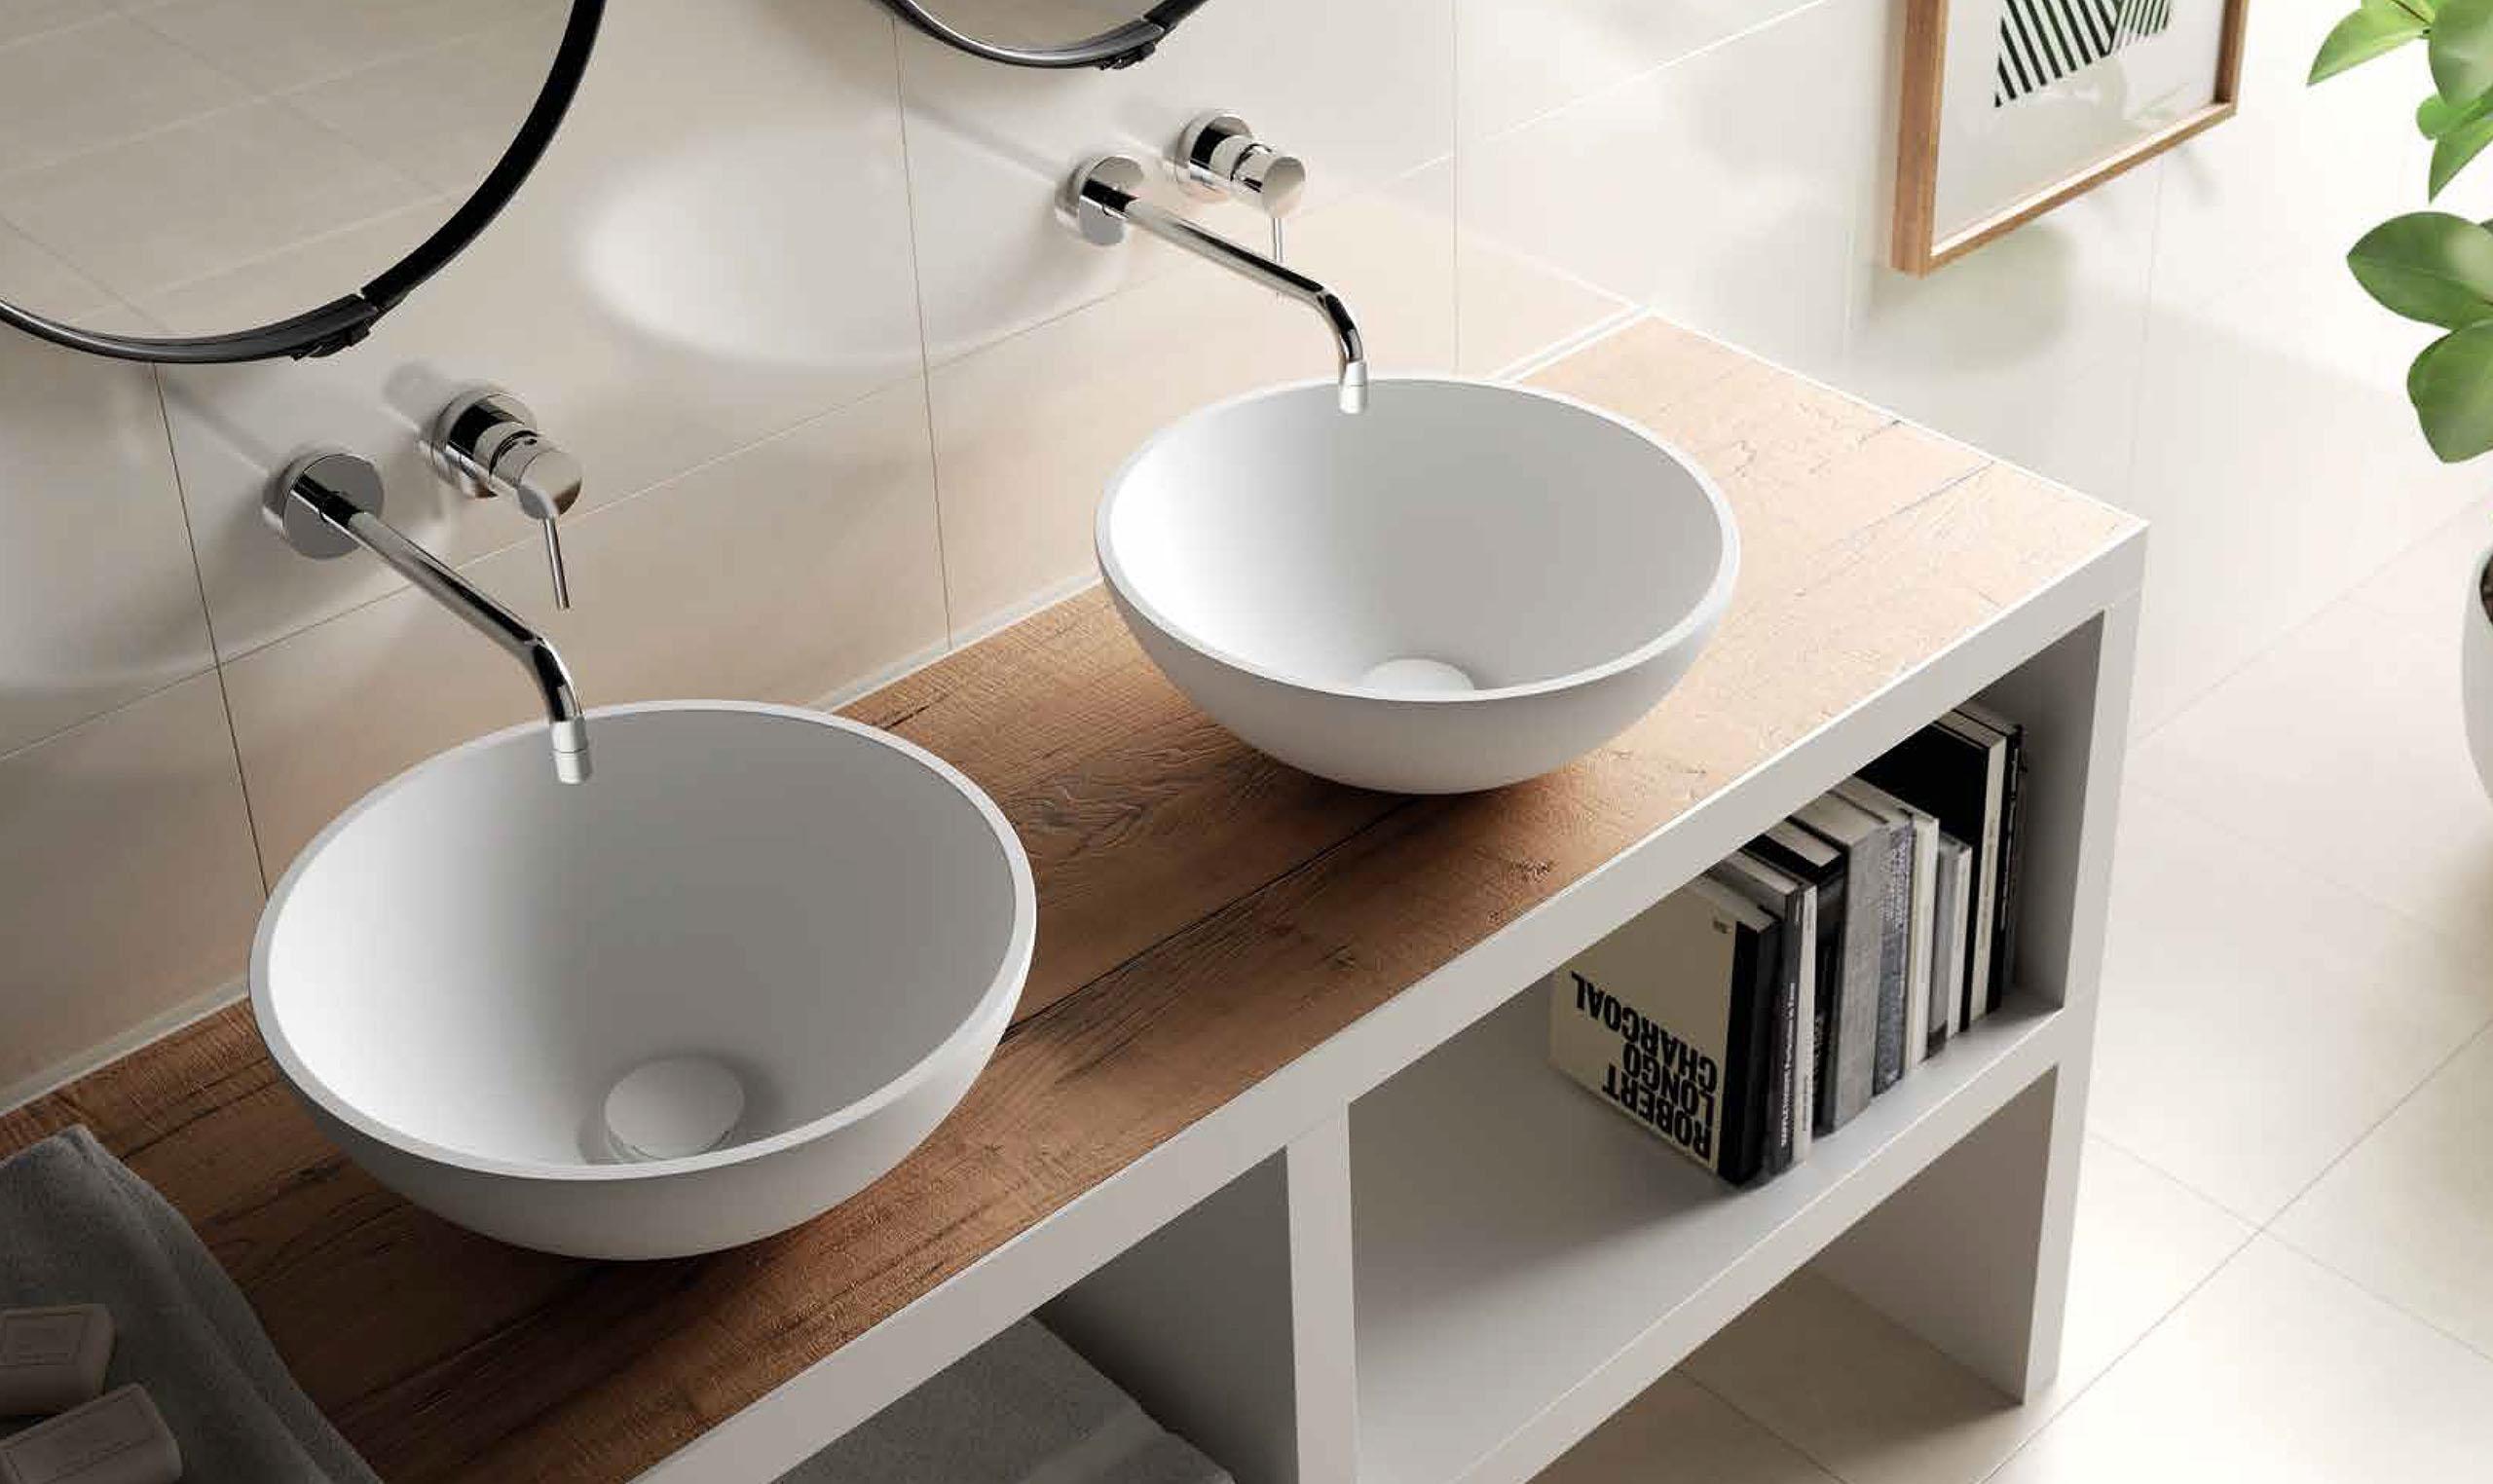 ... Spiegel : Wastafel formido. Wastafel natuursteen. Wastafel beton cire